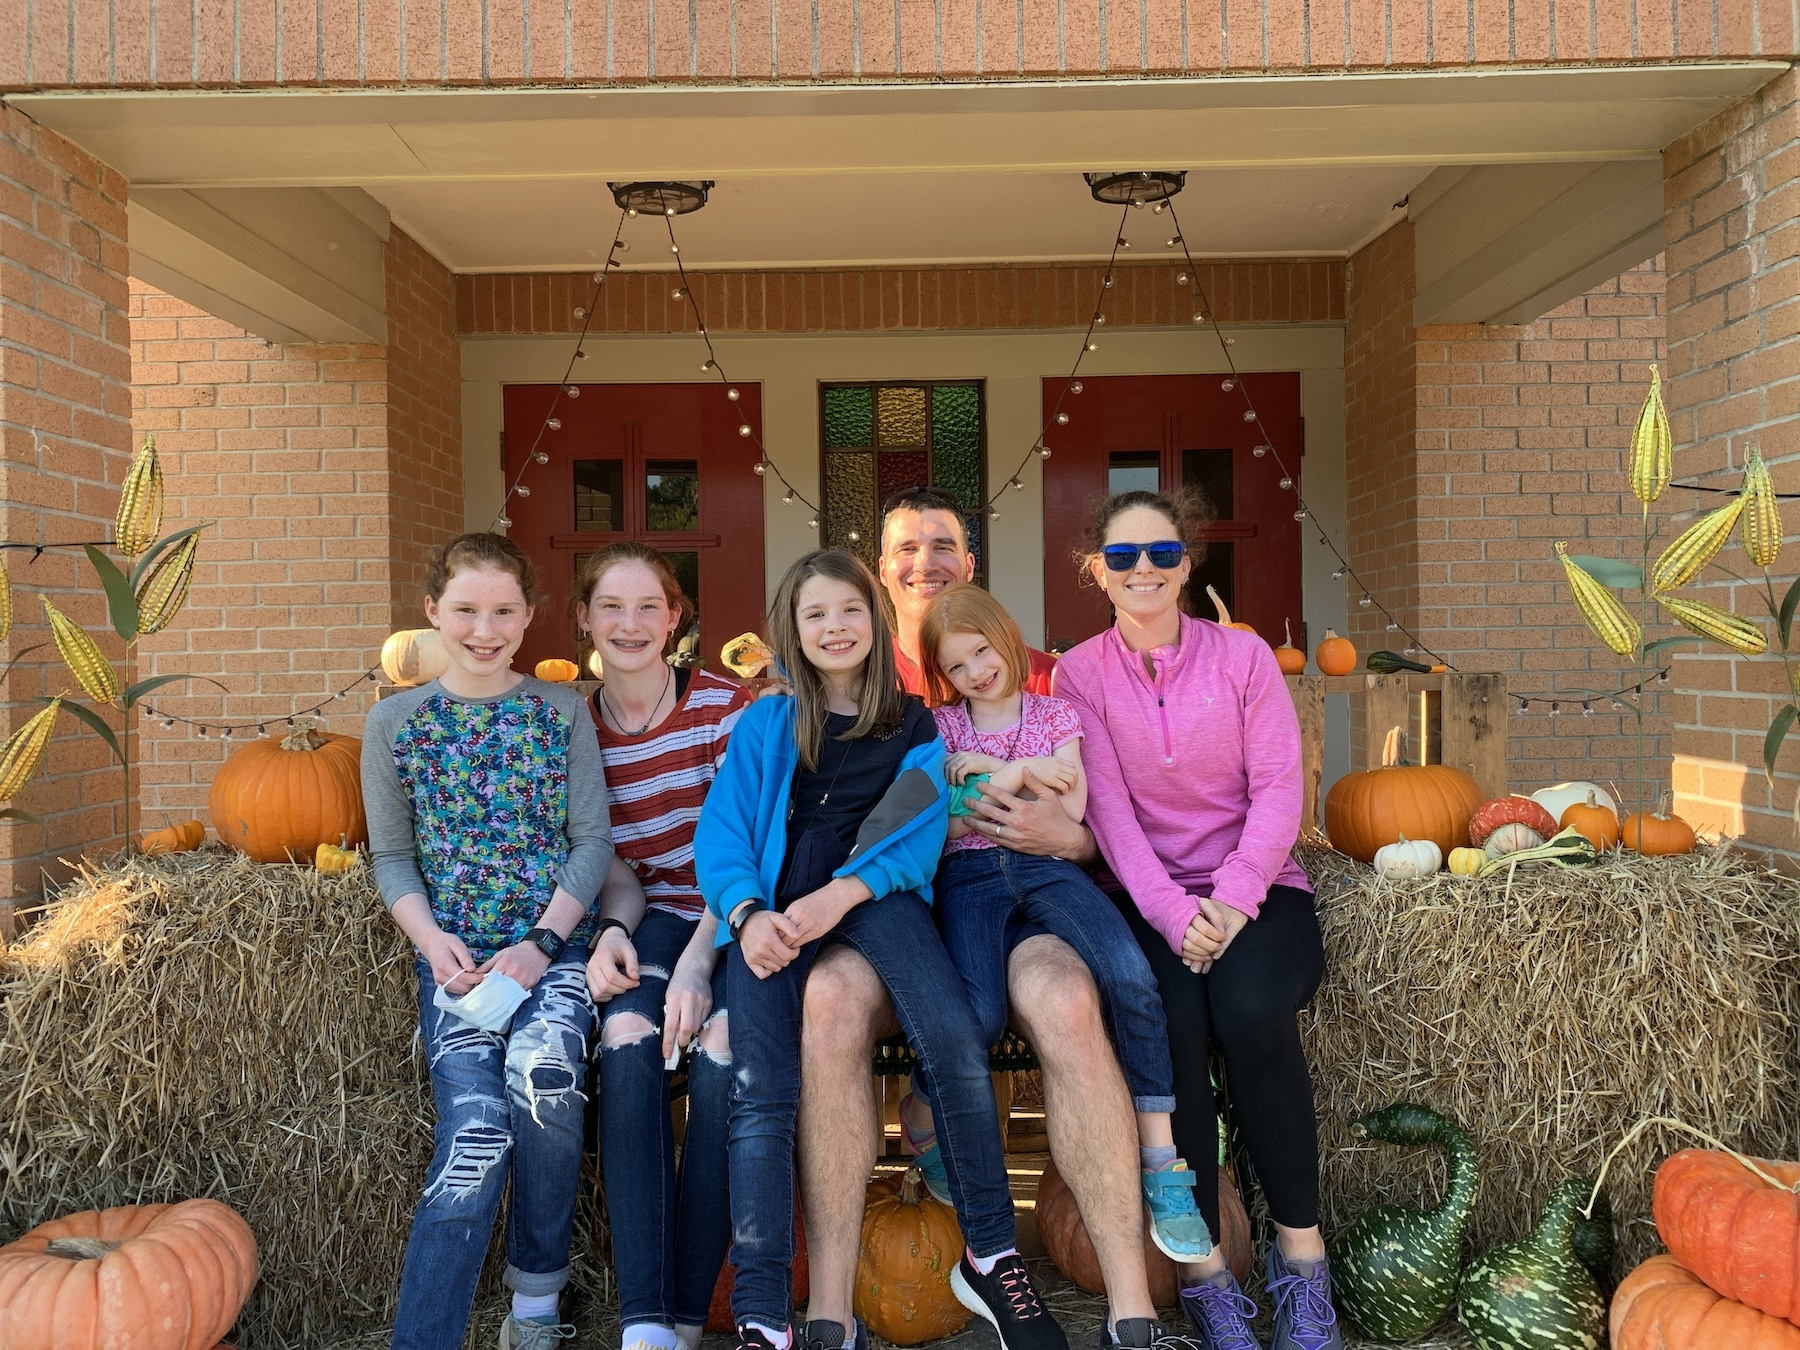 pumpkln patch 2020 family